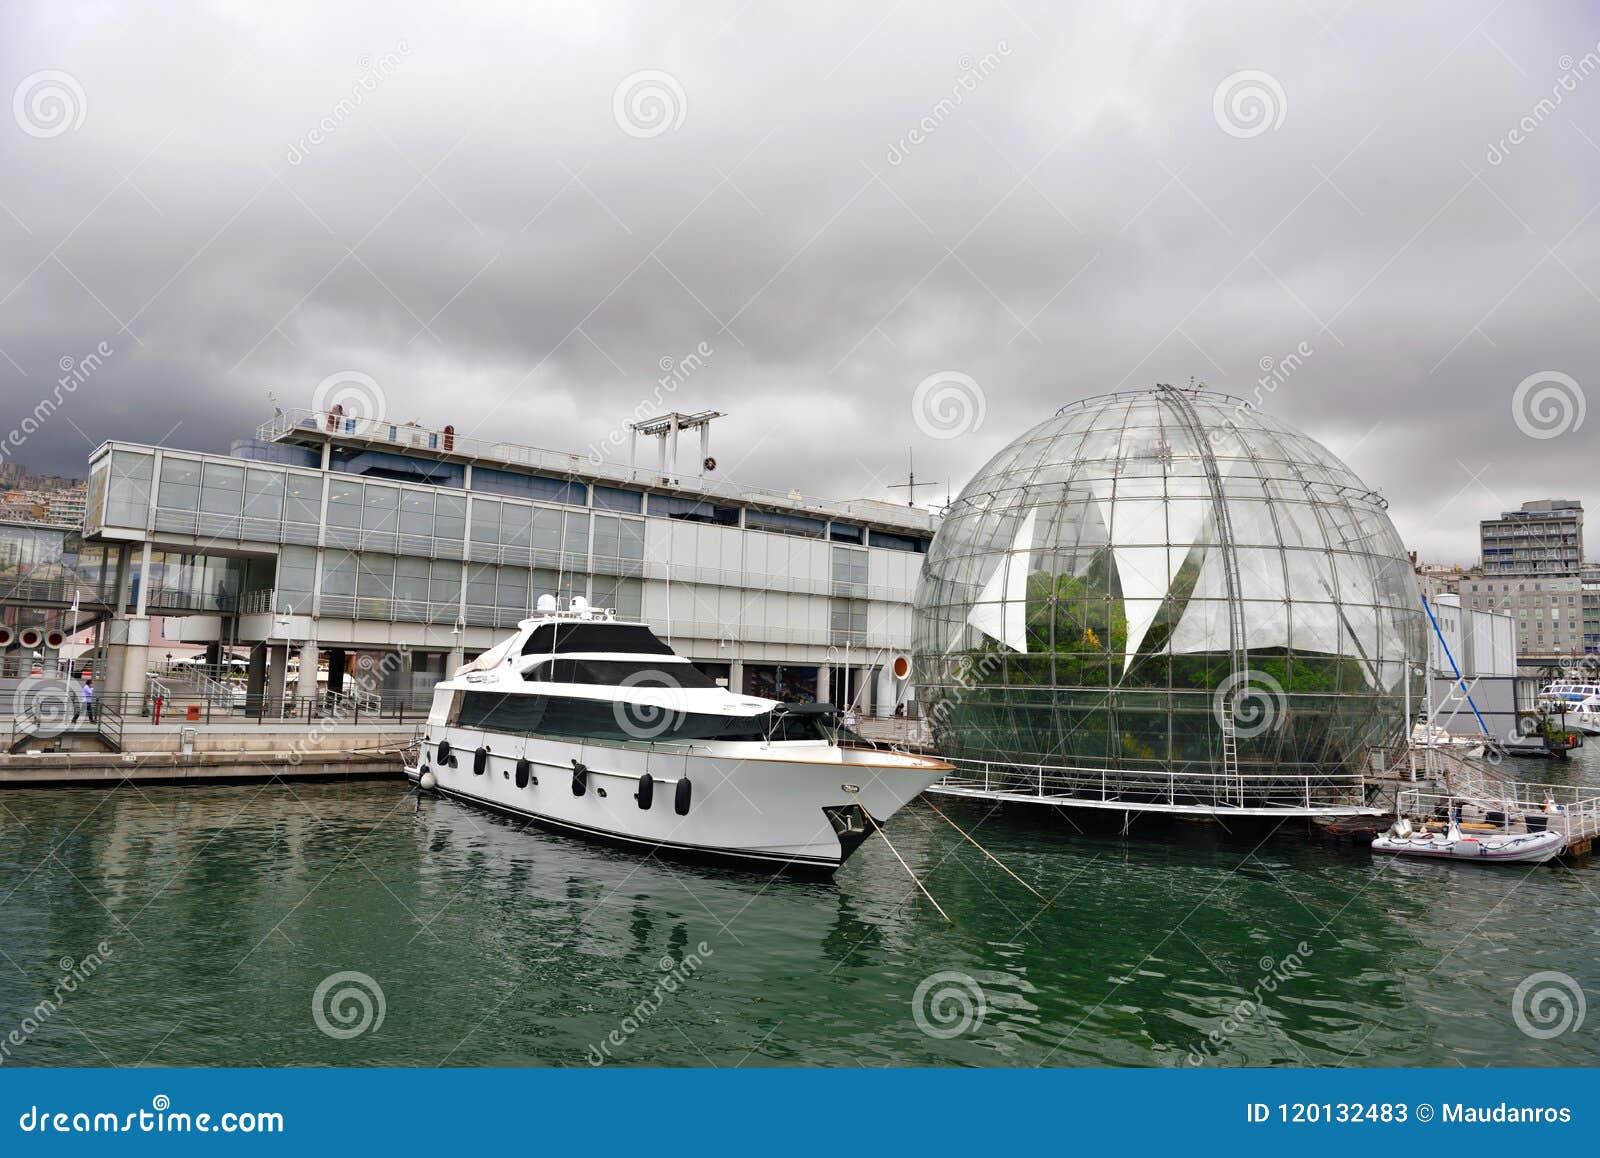 The bubble biosphere by Renzo Piano Genoa Italy